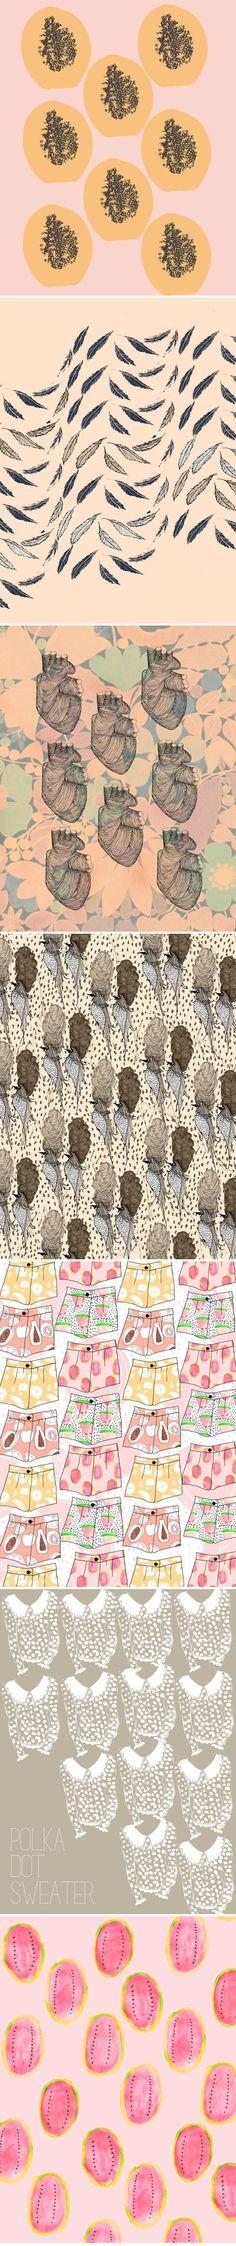 patterns by kendra dandy